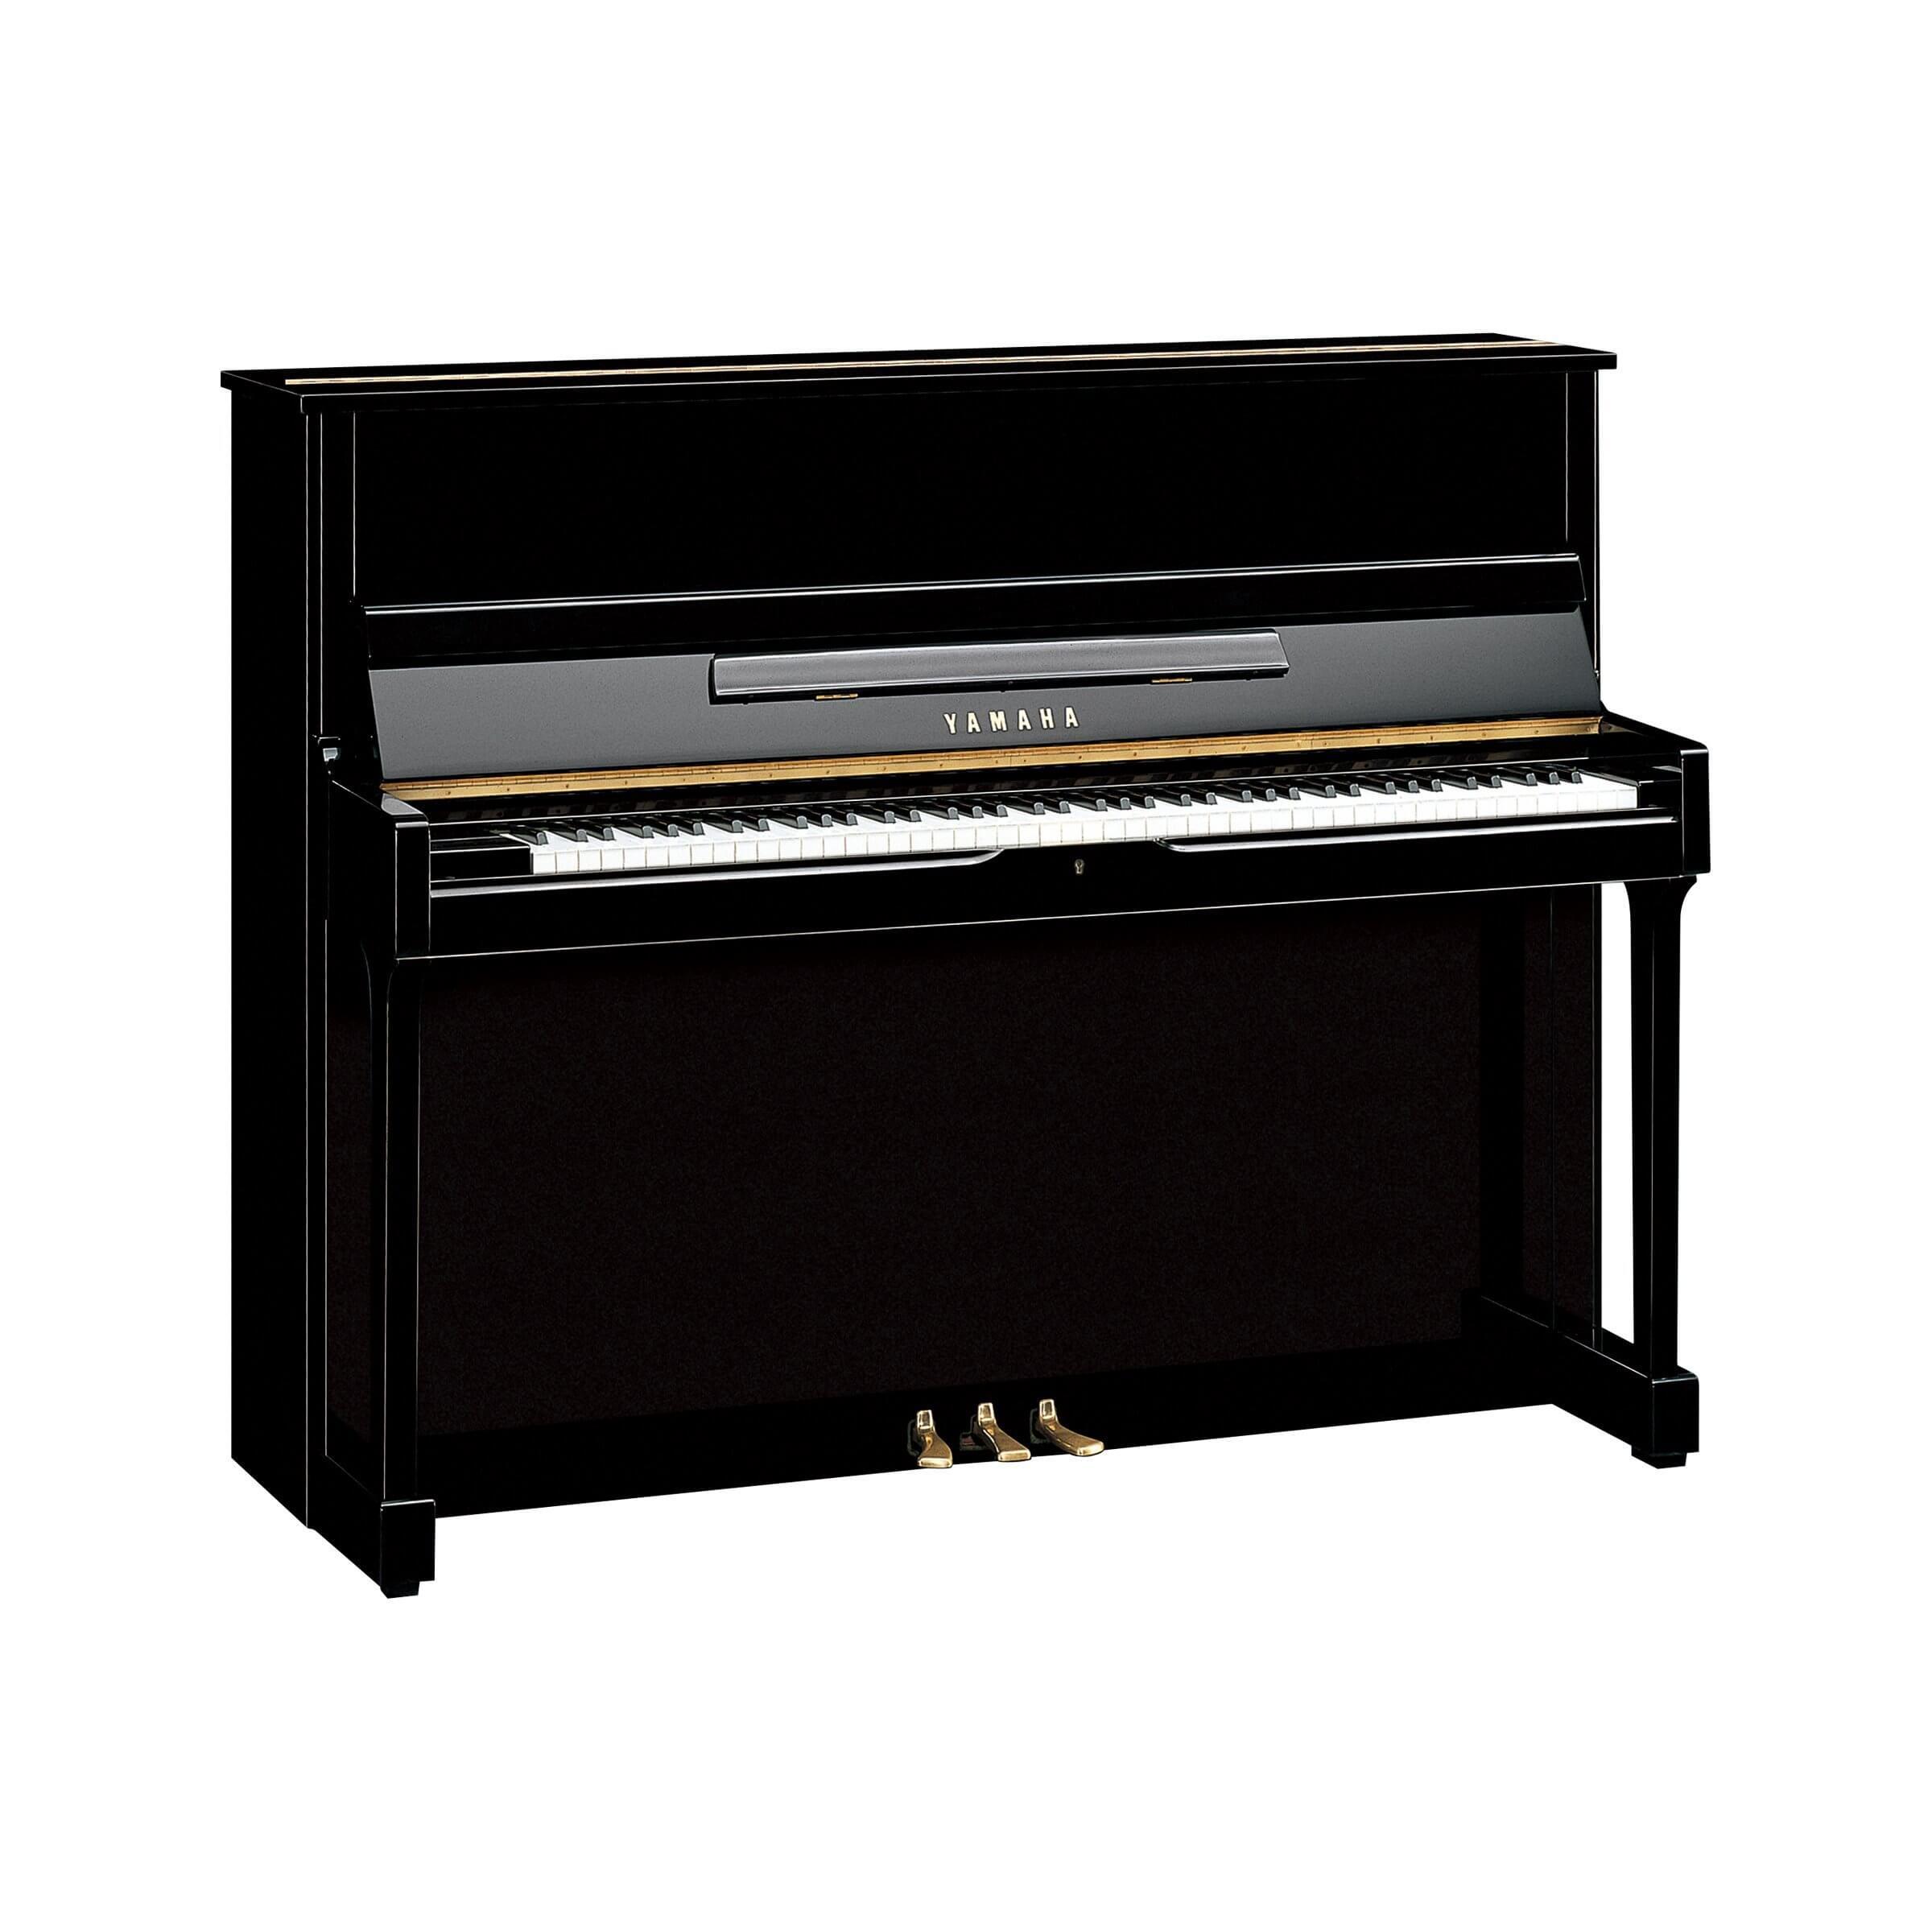 Piano Vertical Yamaha SU118 Negro Pulido